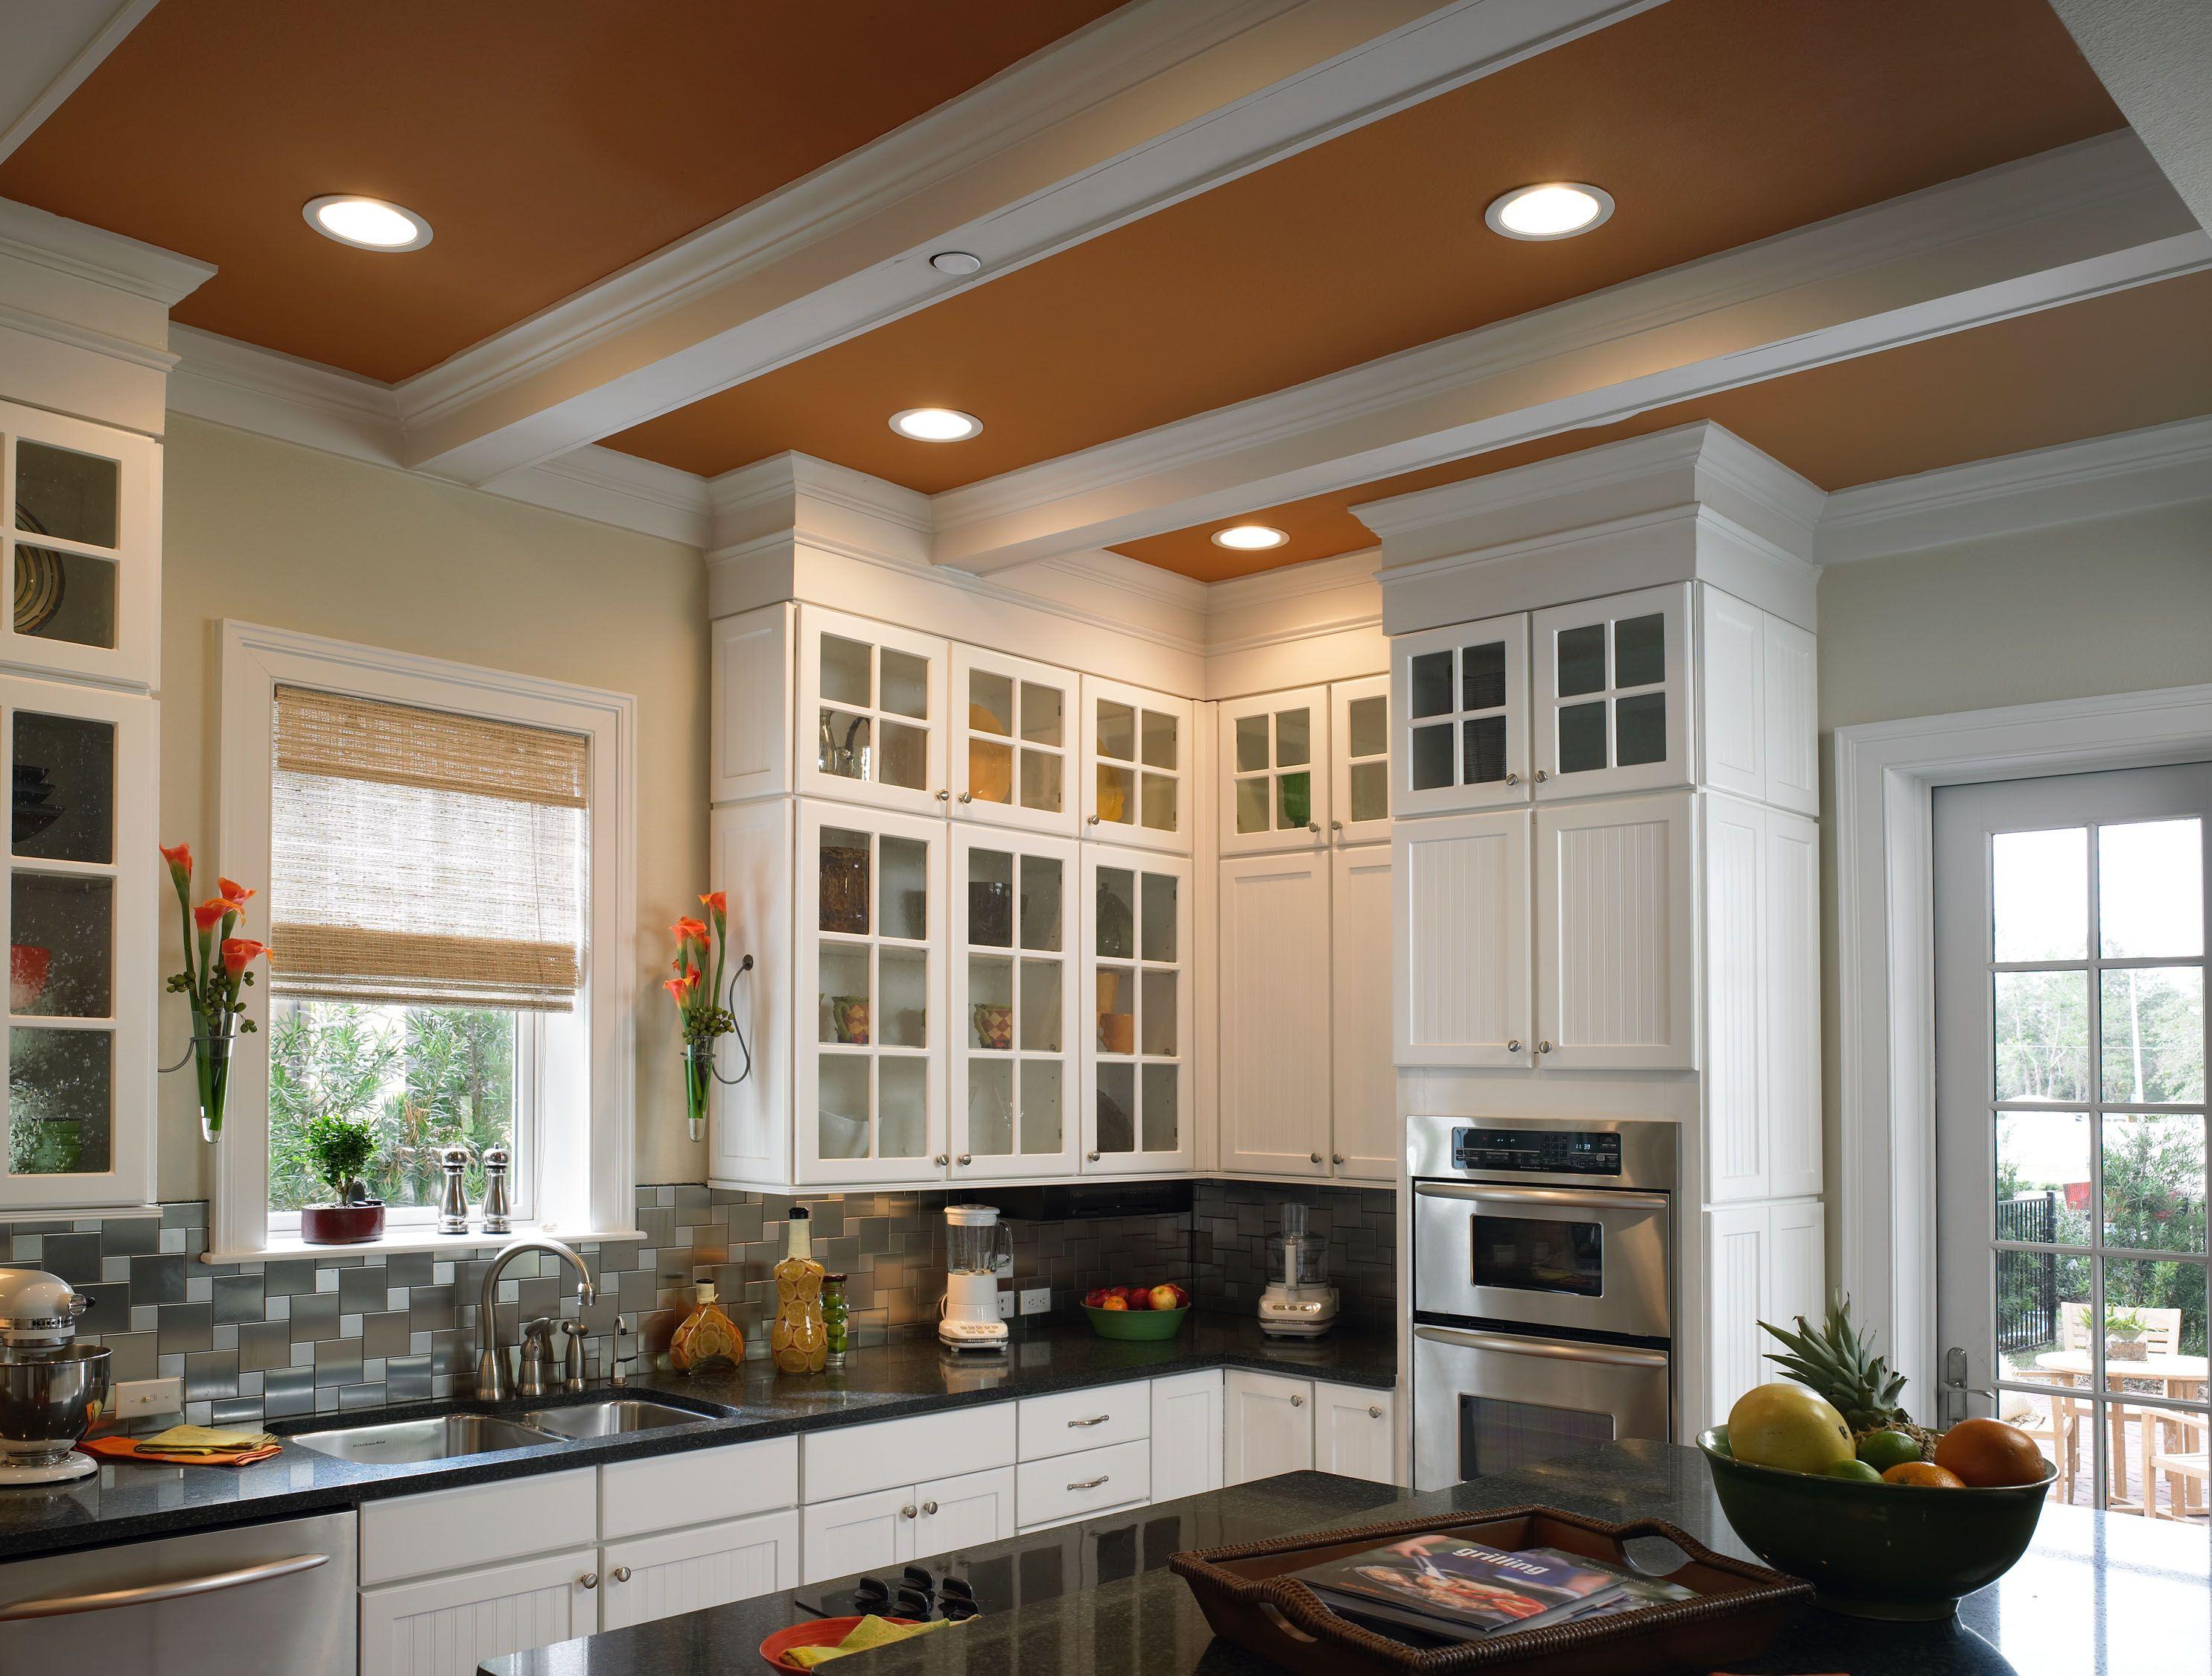 Decorative Ceiling Beams Ideas